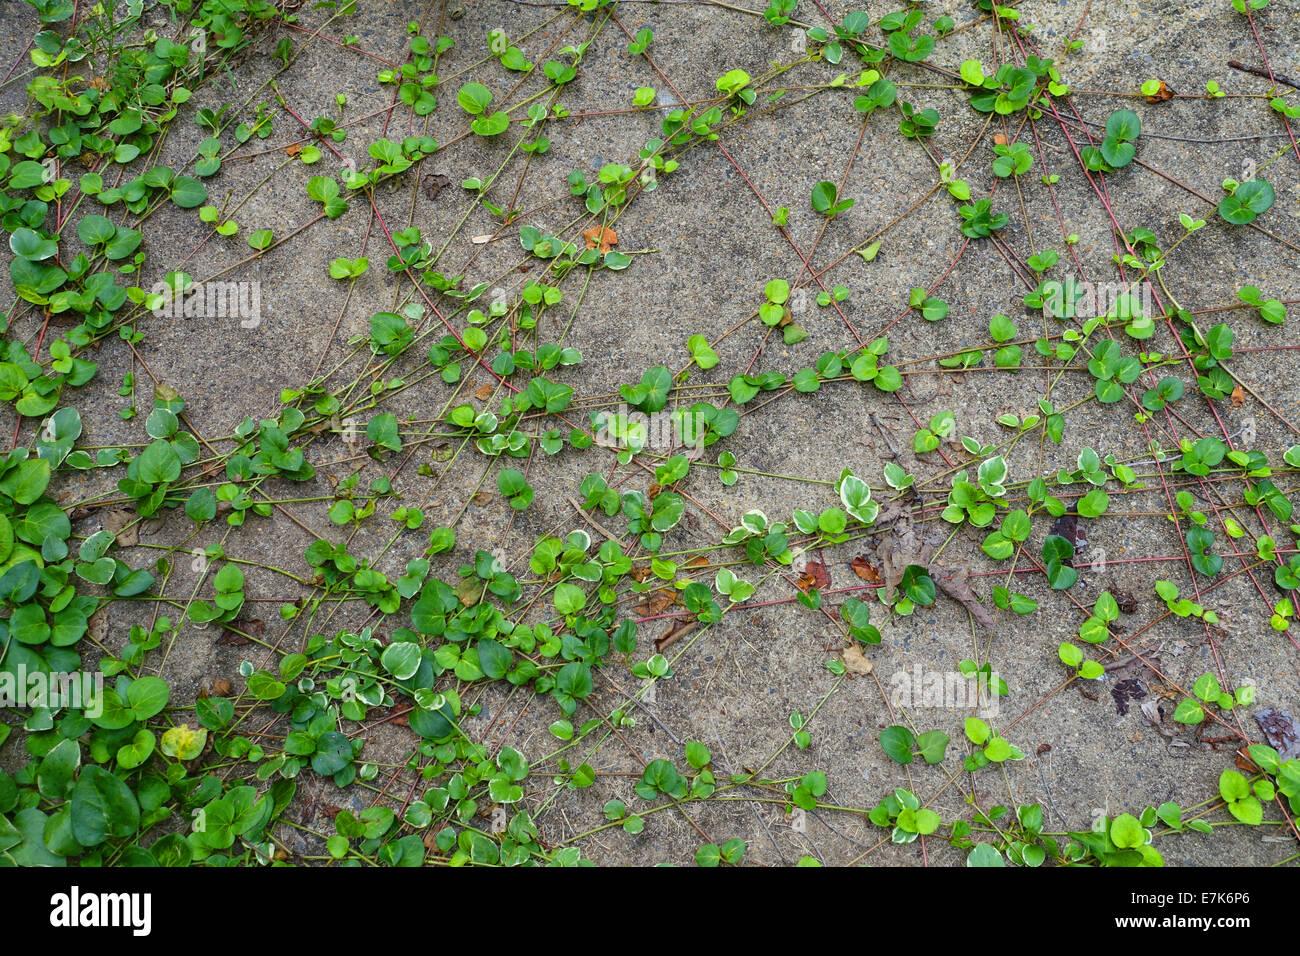 Invasive Weeds Stock Photos Amp Invasive Weeds Stock Images